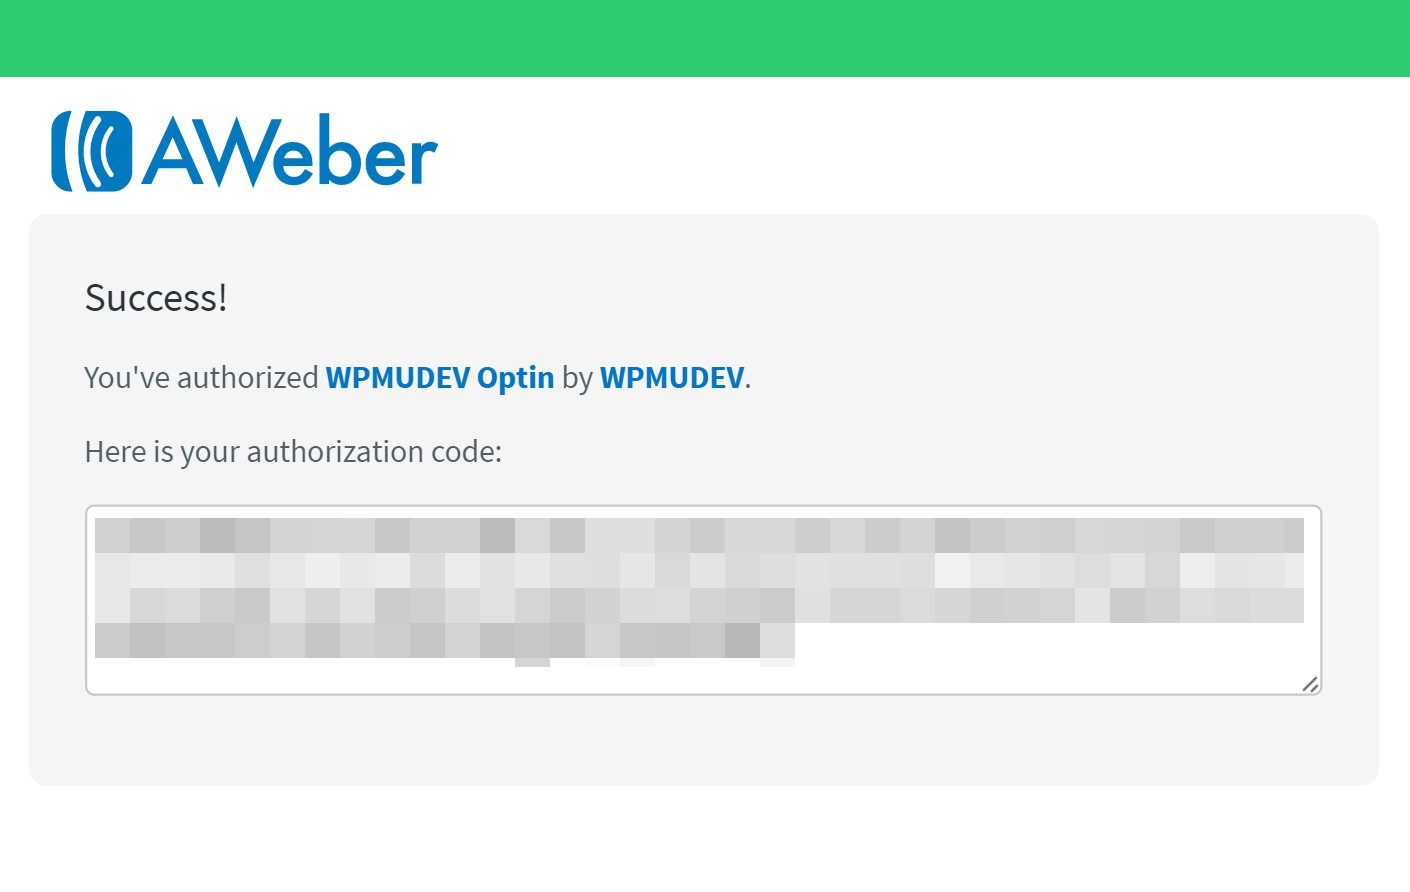 aweber_auth_code